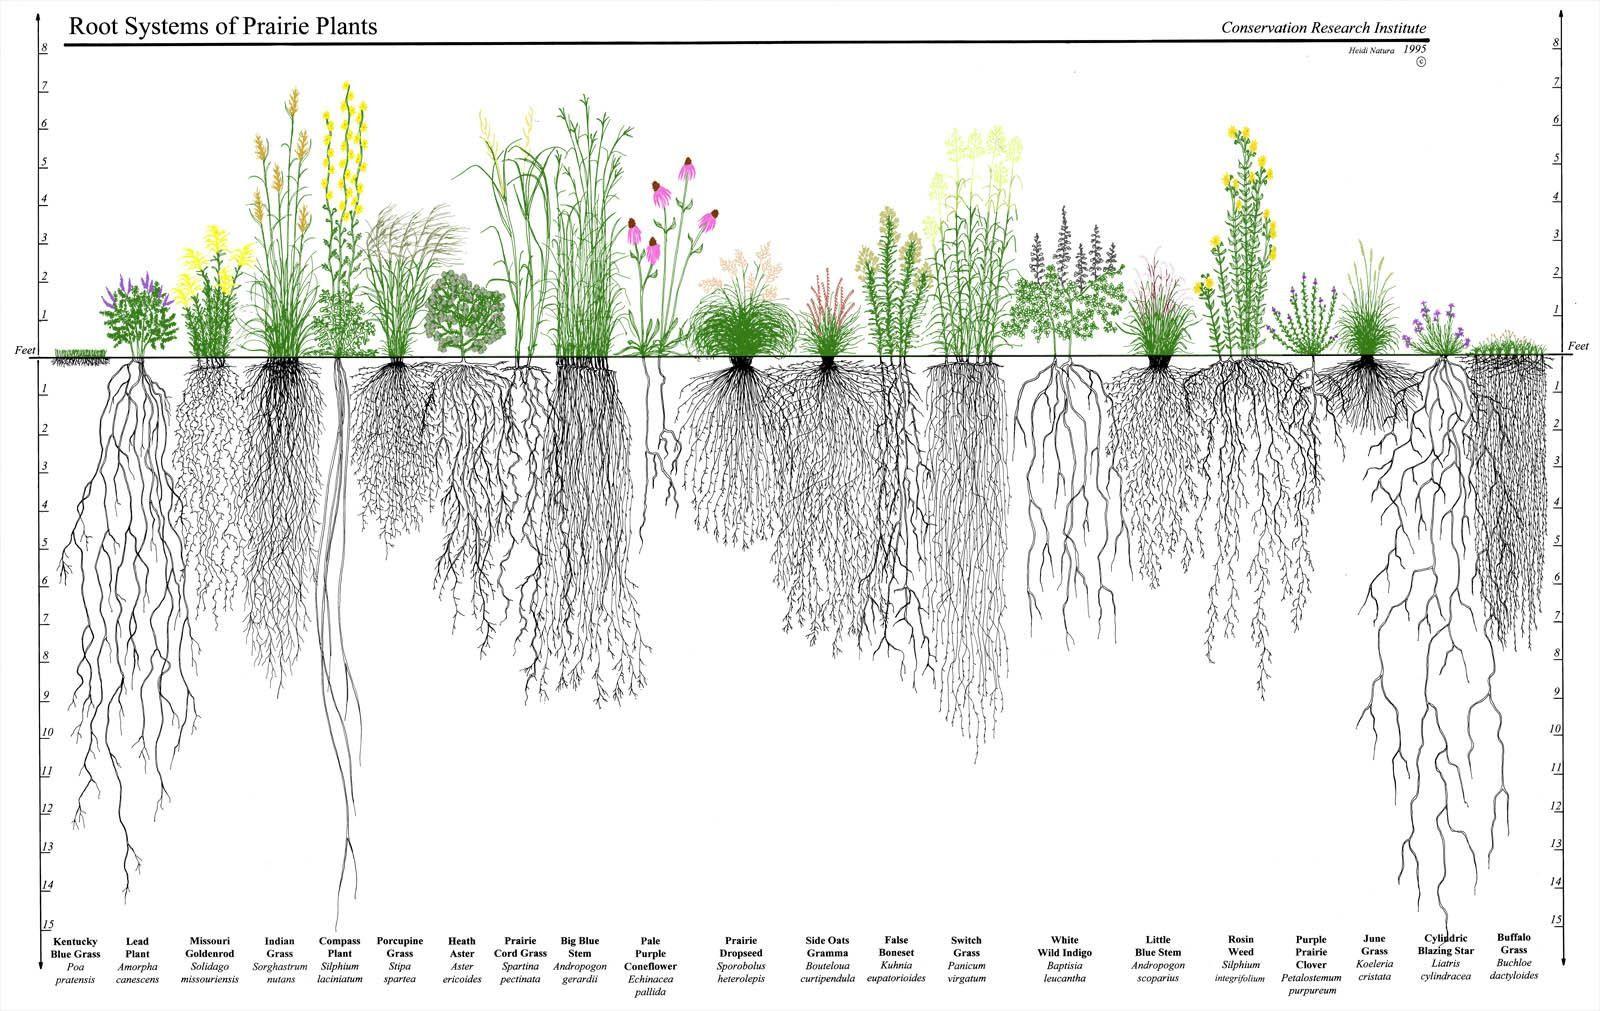 Plant Root Depth